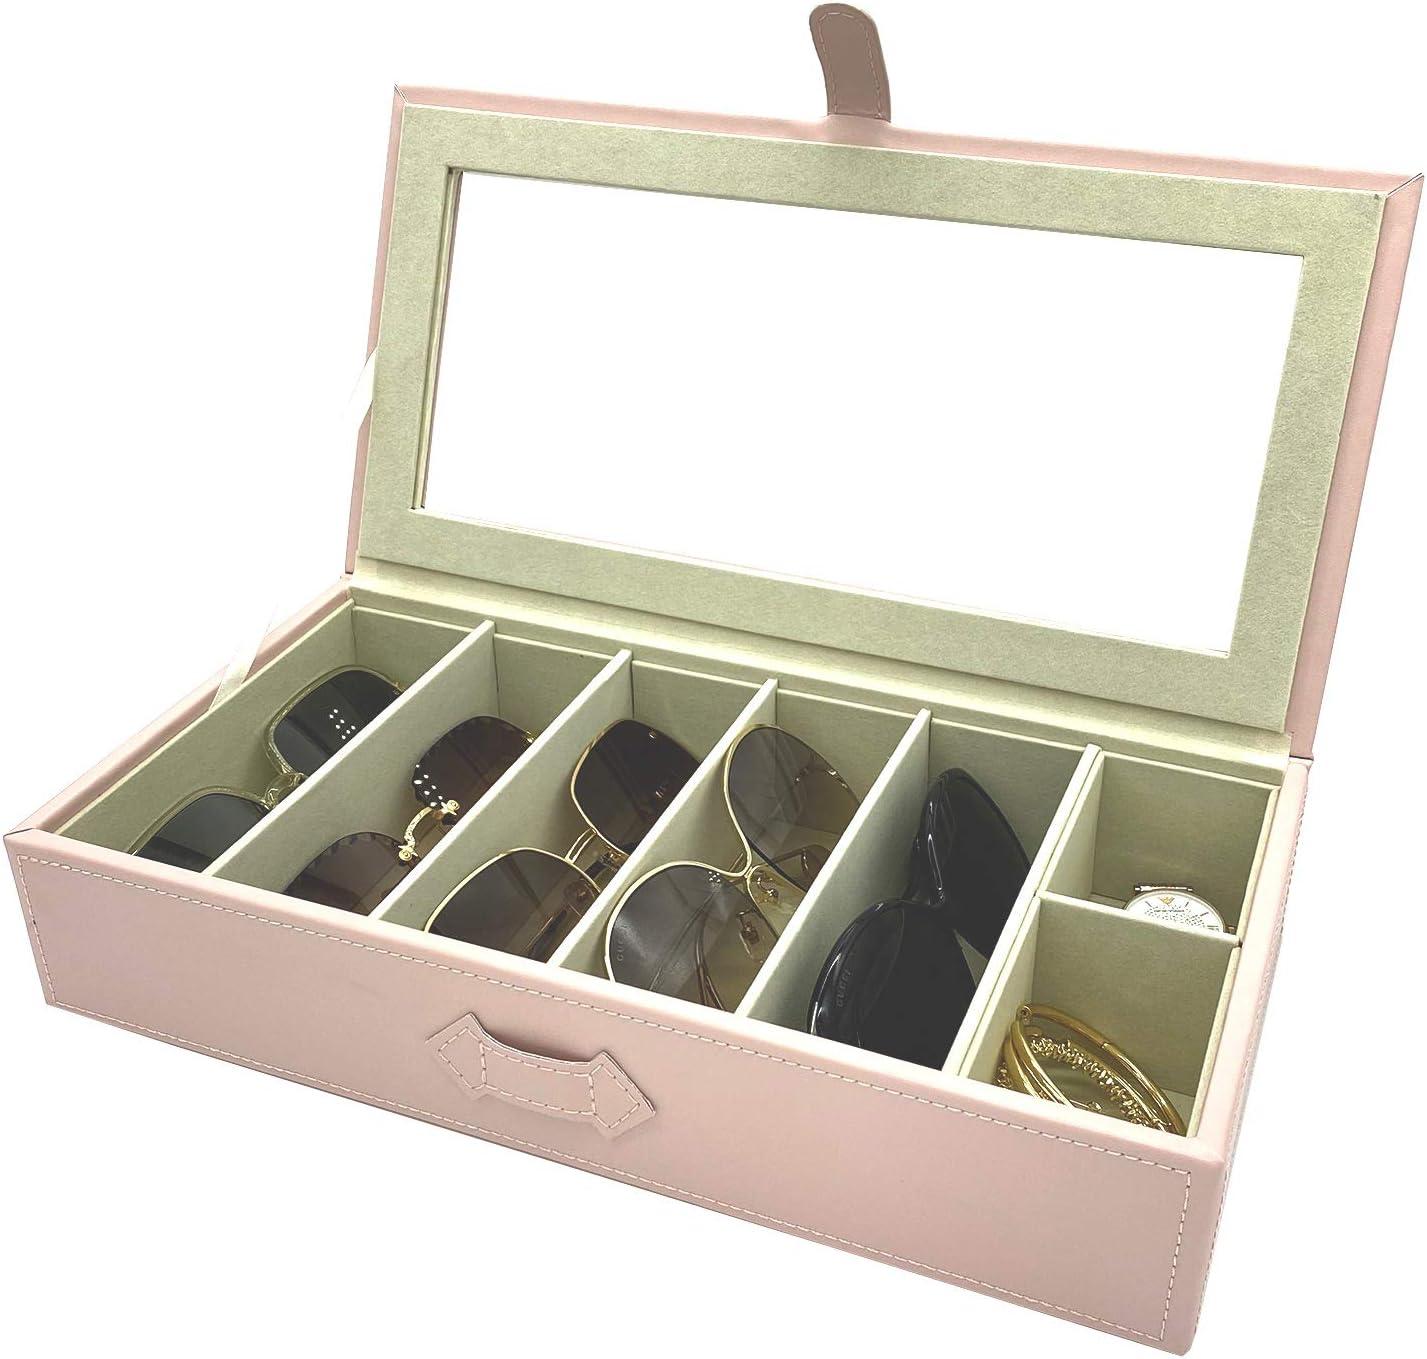 UnionPlus Eyeglass Sunglass Glasses Organizer Collector - 6-Slot Faux Leather Storage Case Box (Pearl Pink)